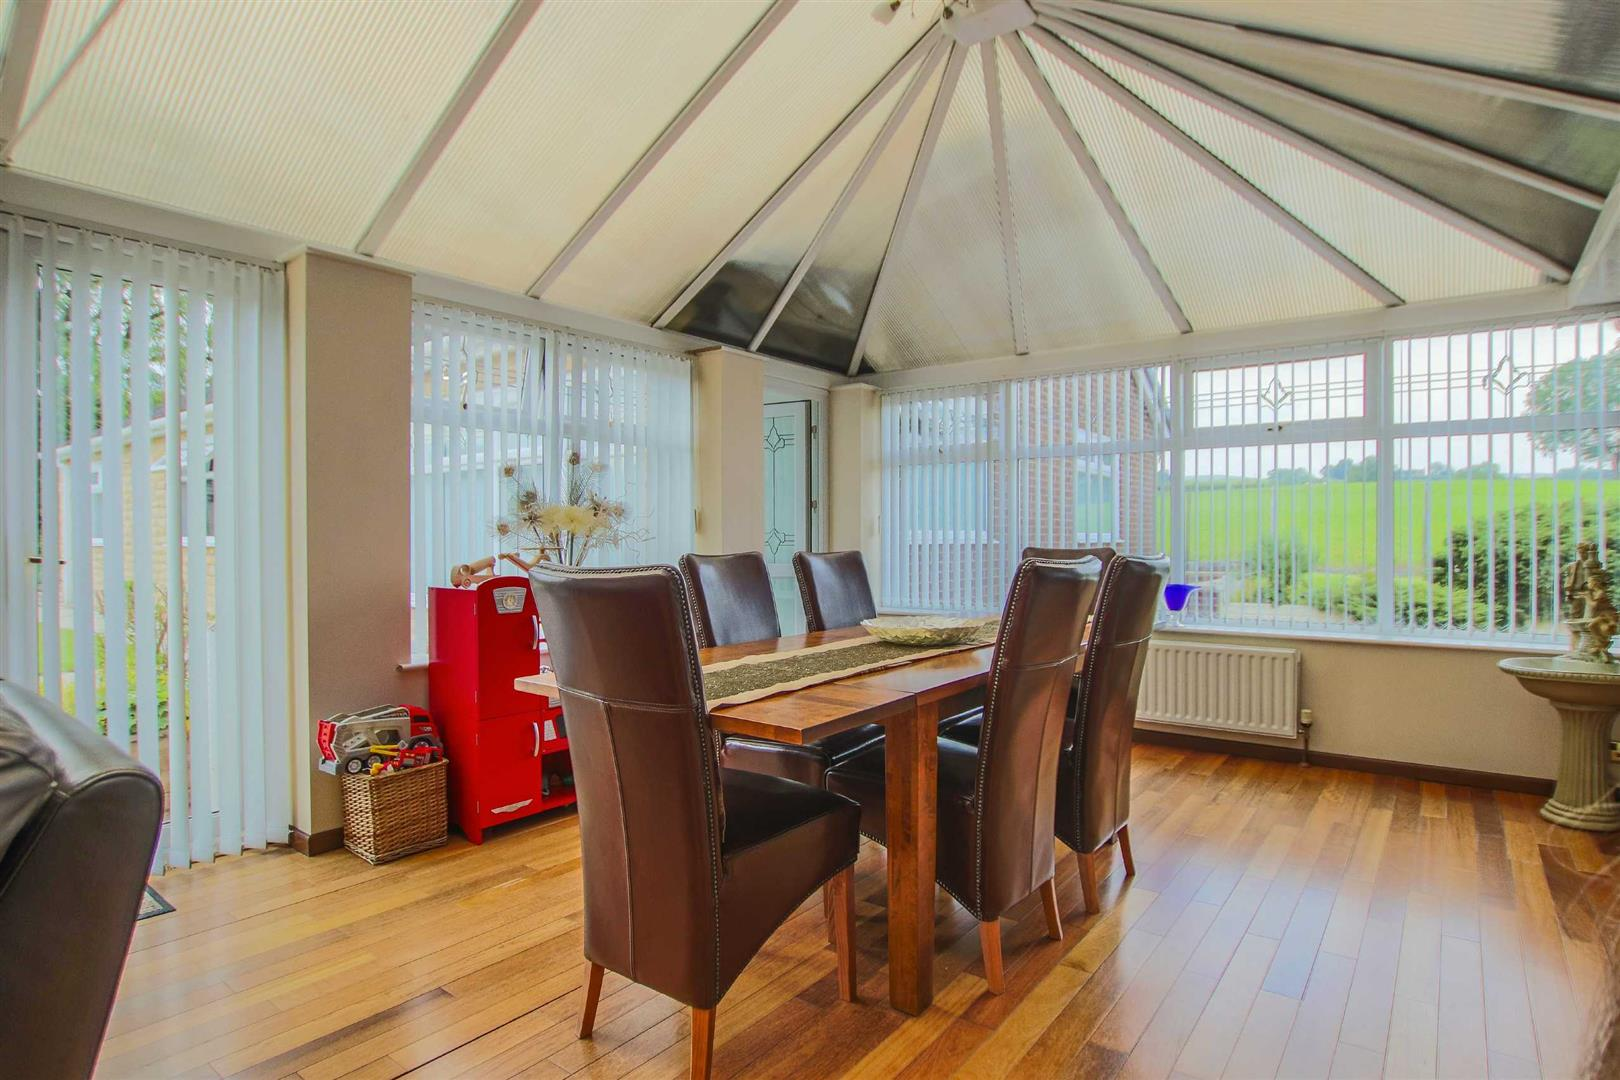 5 Bedroom Detached Bungalow For Sale - Image 15